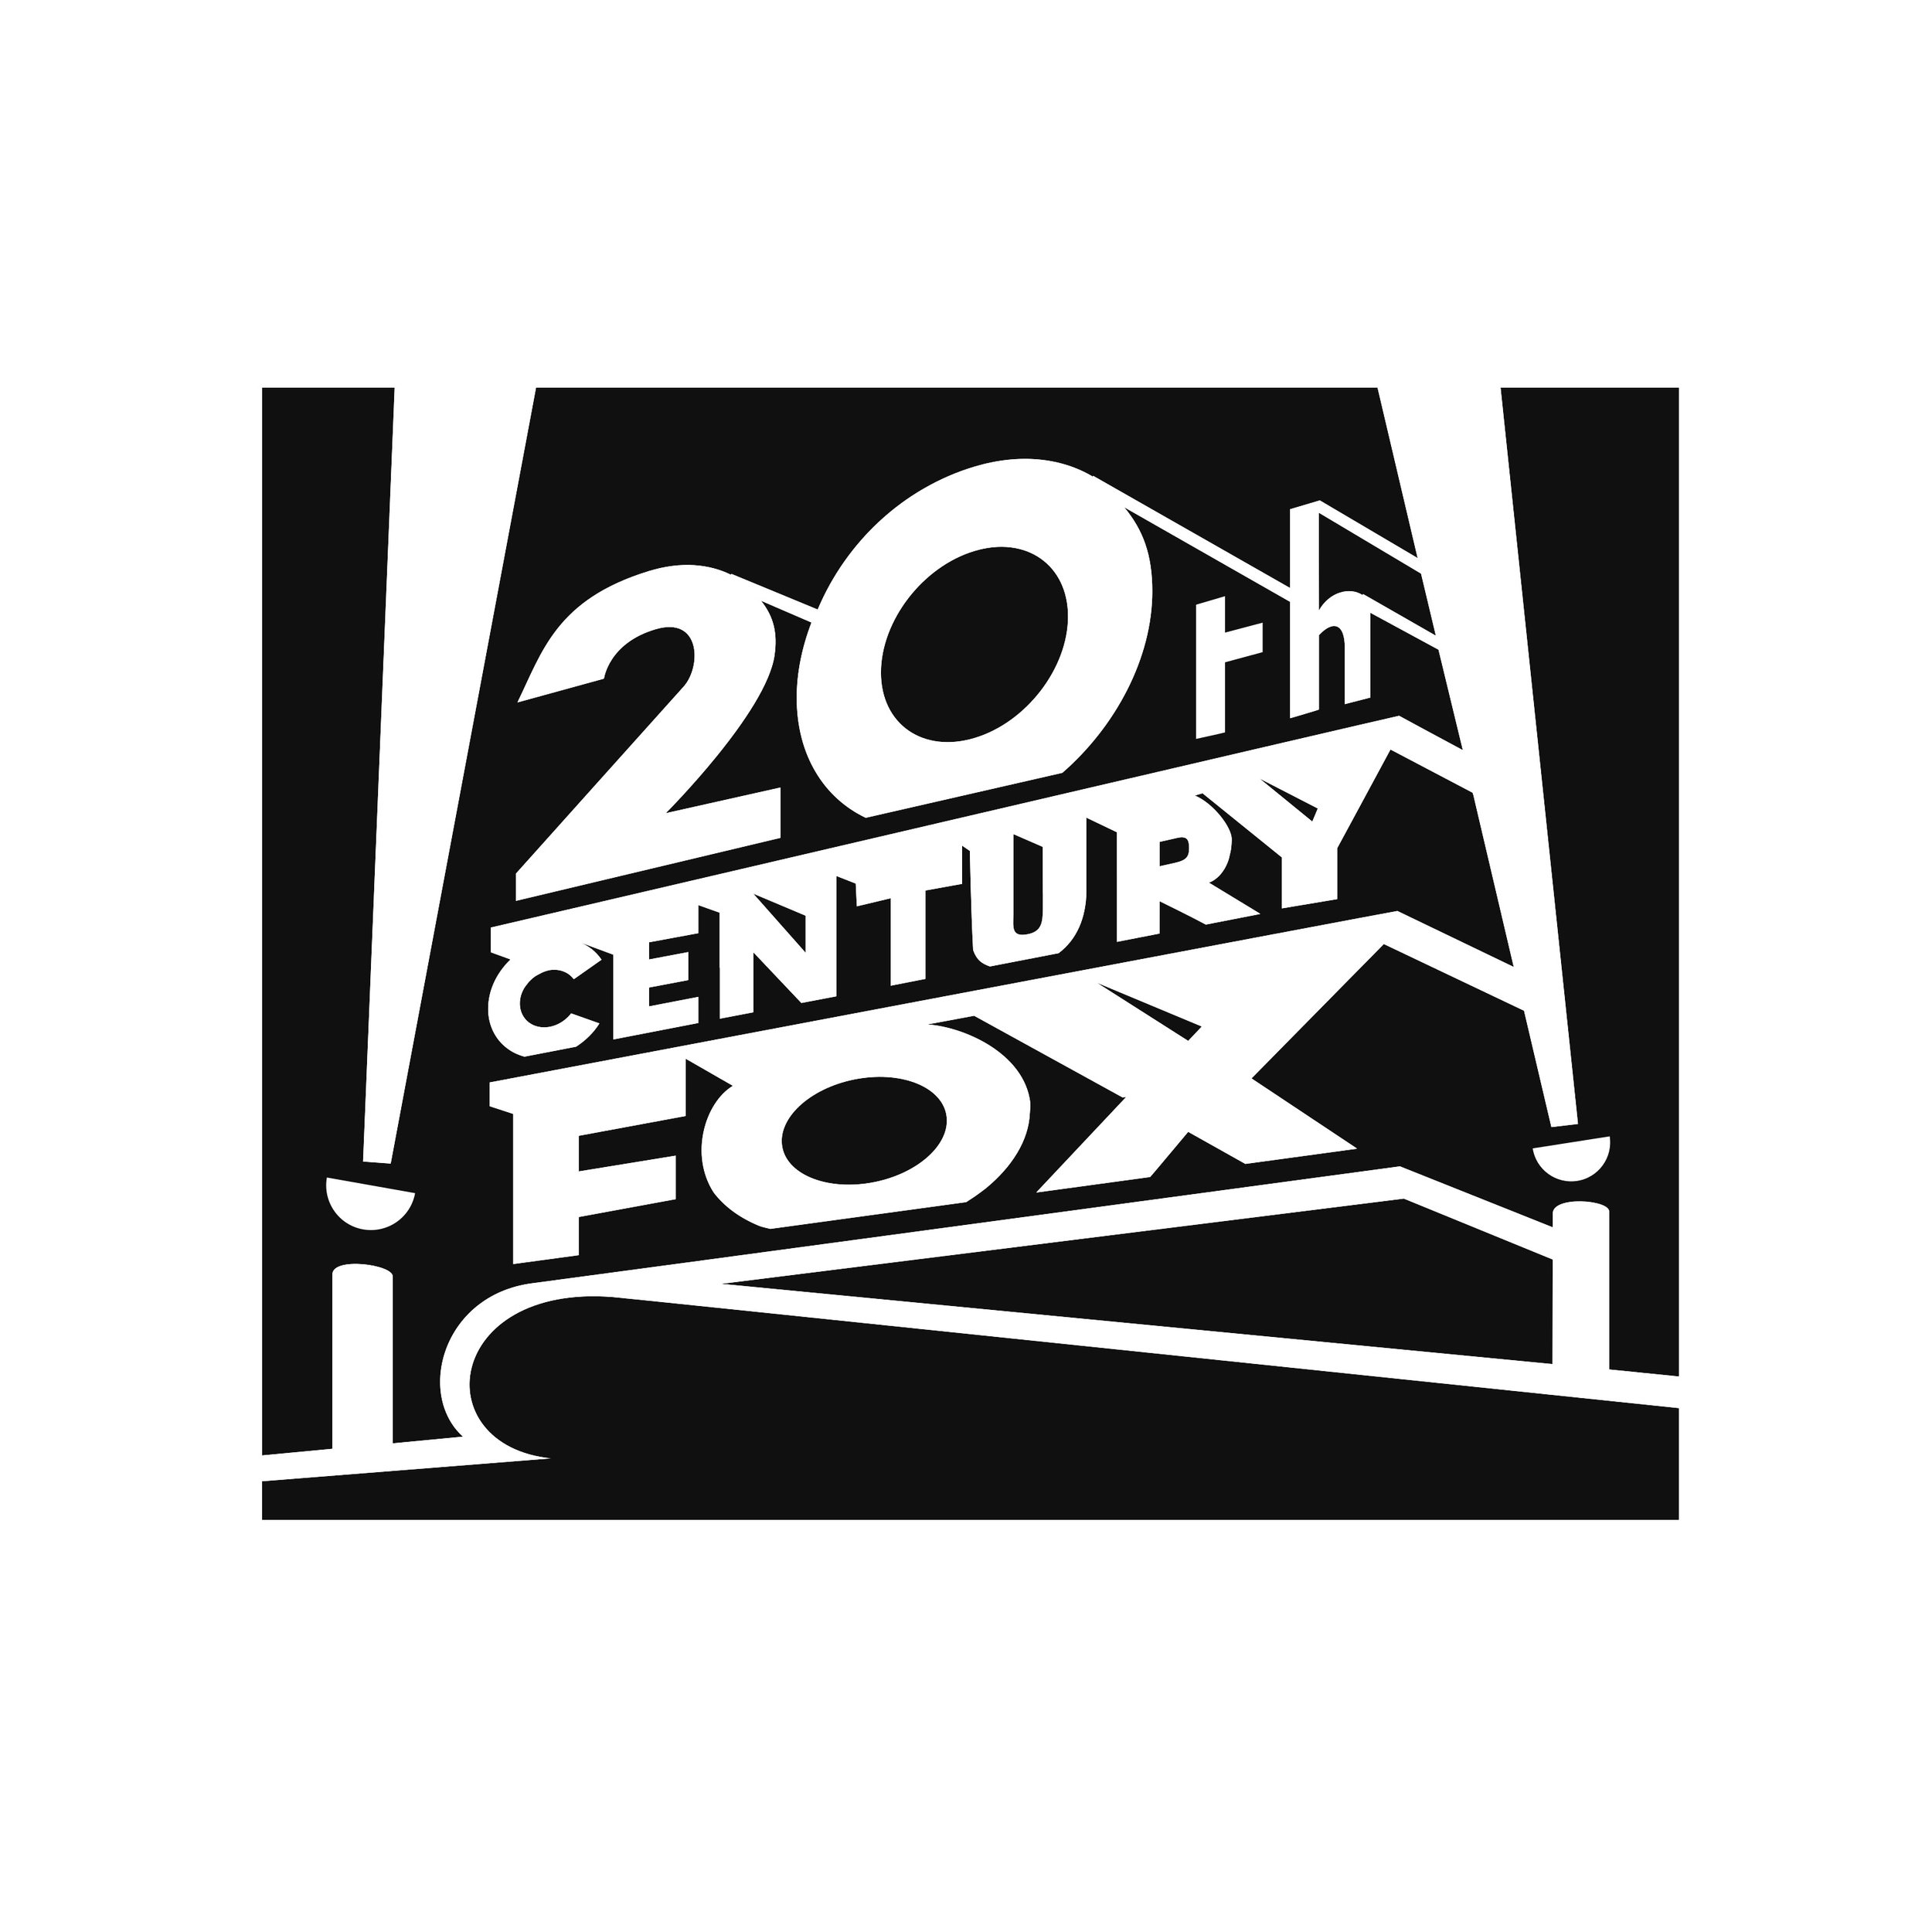 20 Century Fox logo.jpg